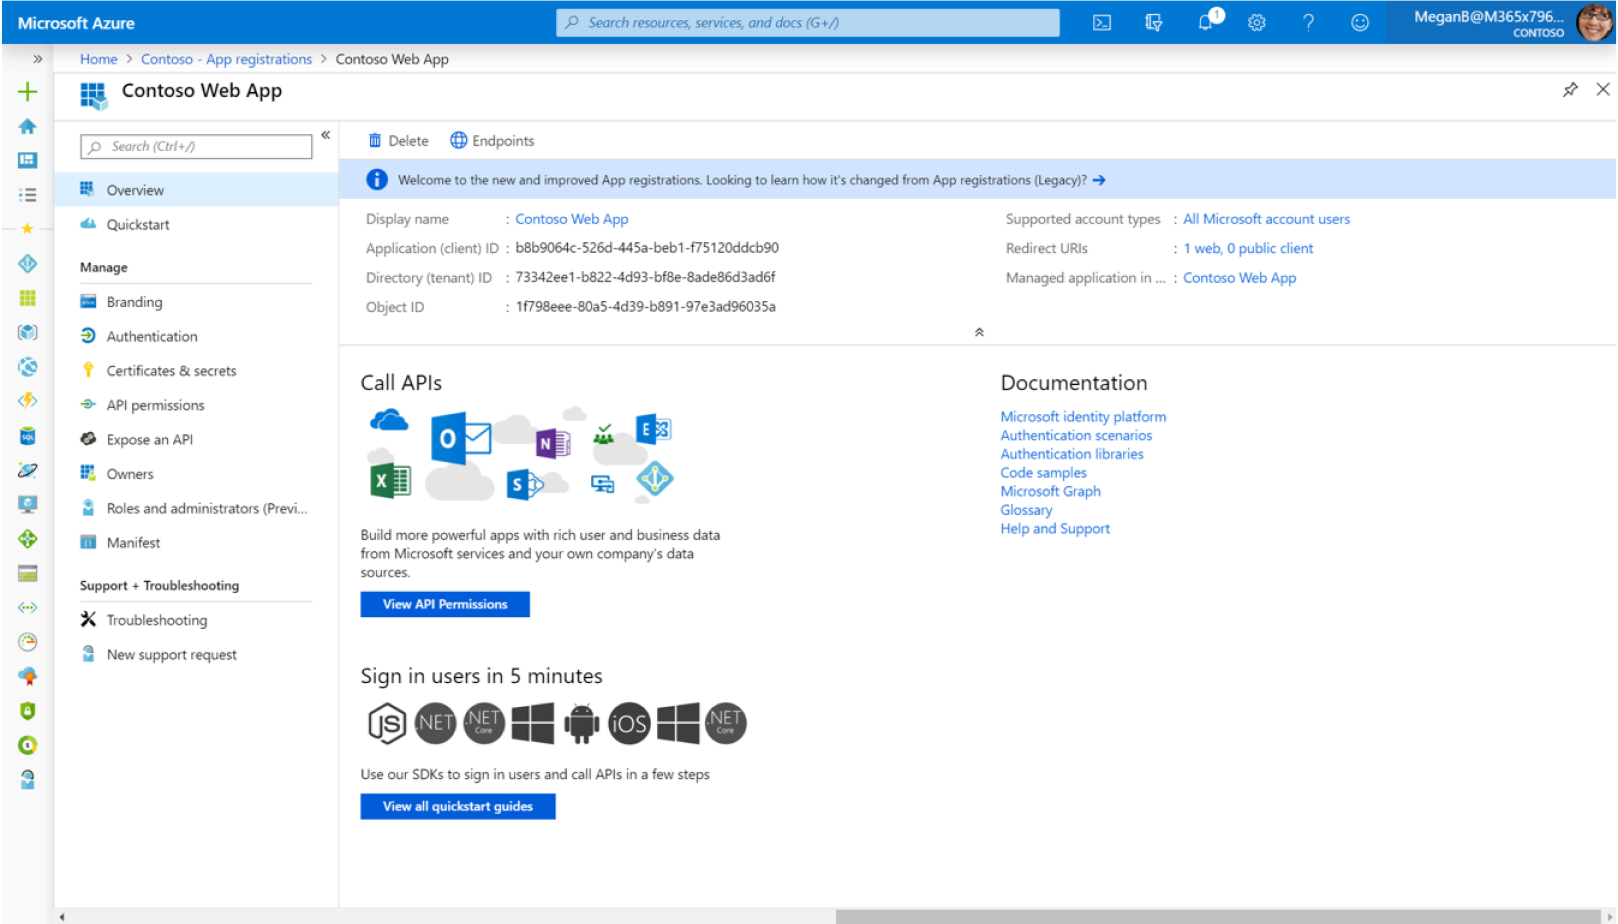 Azure Active Directory overview